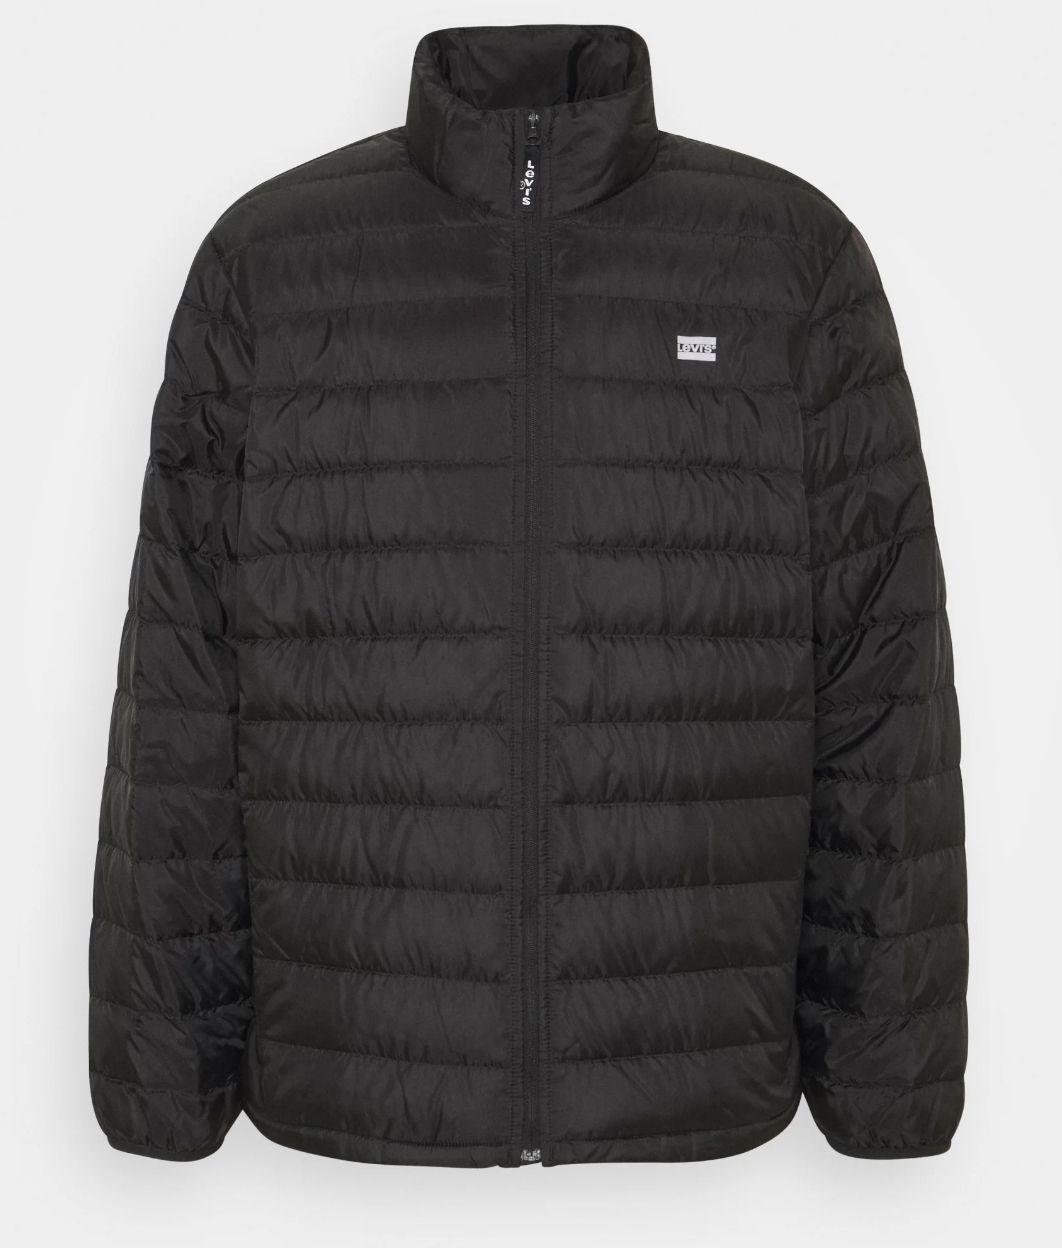 Levi's Presidio Packable Jacket (was €129,95)